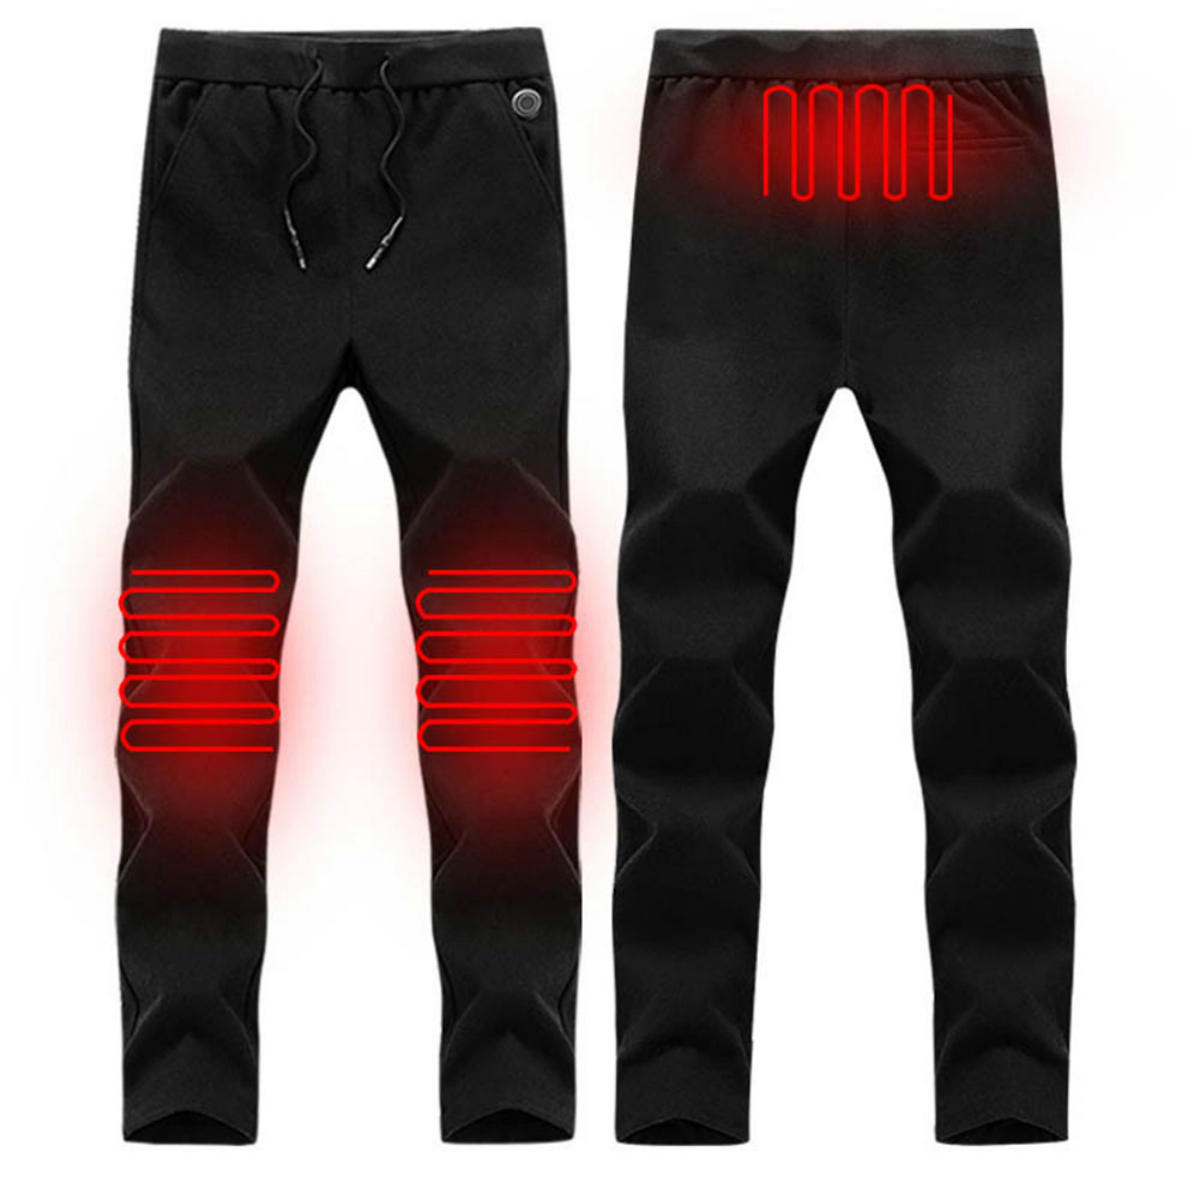 electric heated warm pants men women heating base layer ...